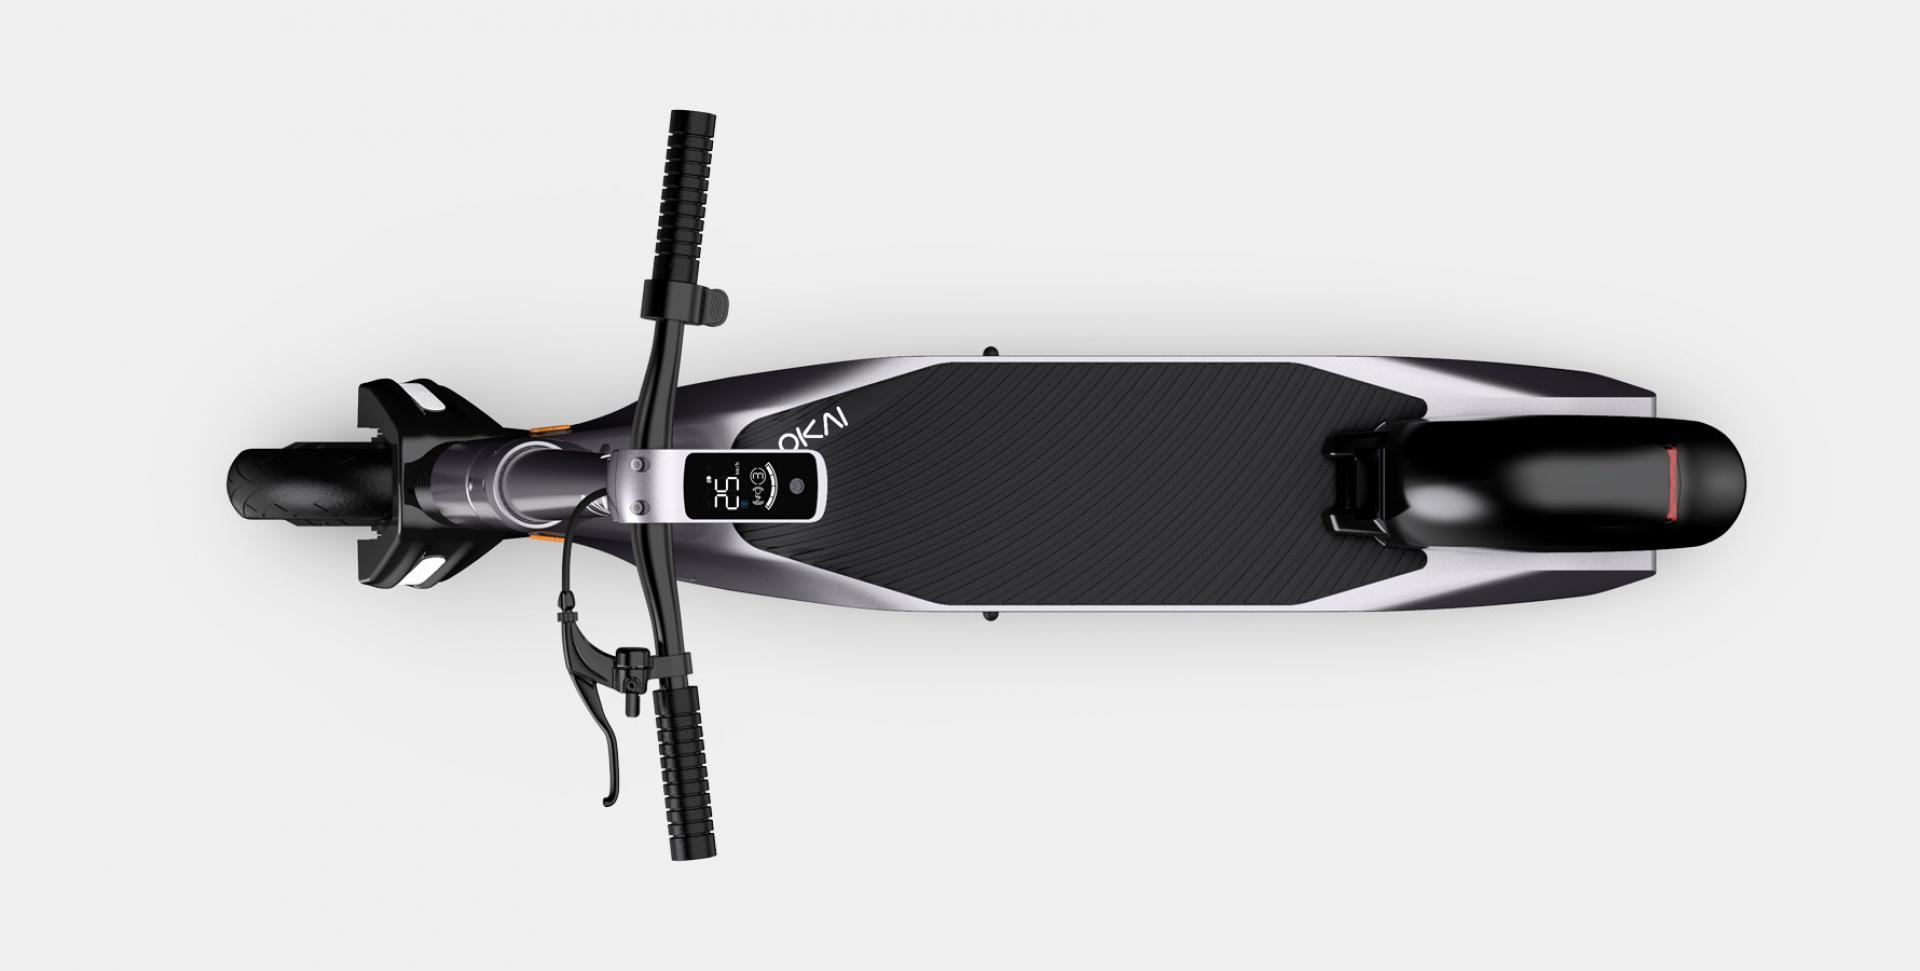 okai-electric-scooter-es500-grey.jpg